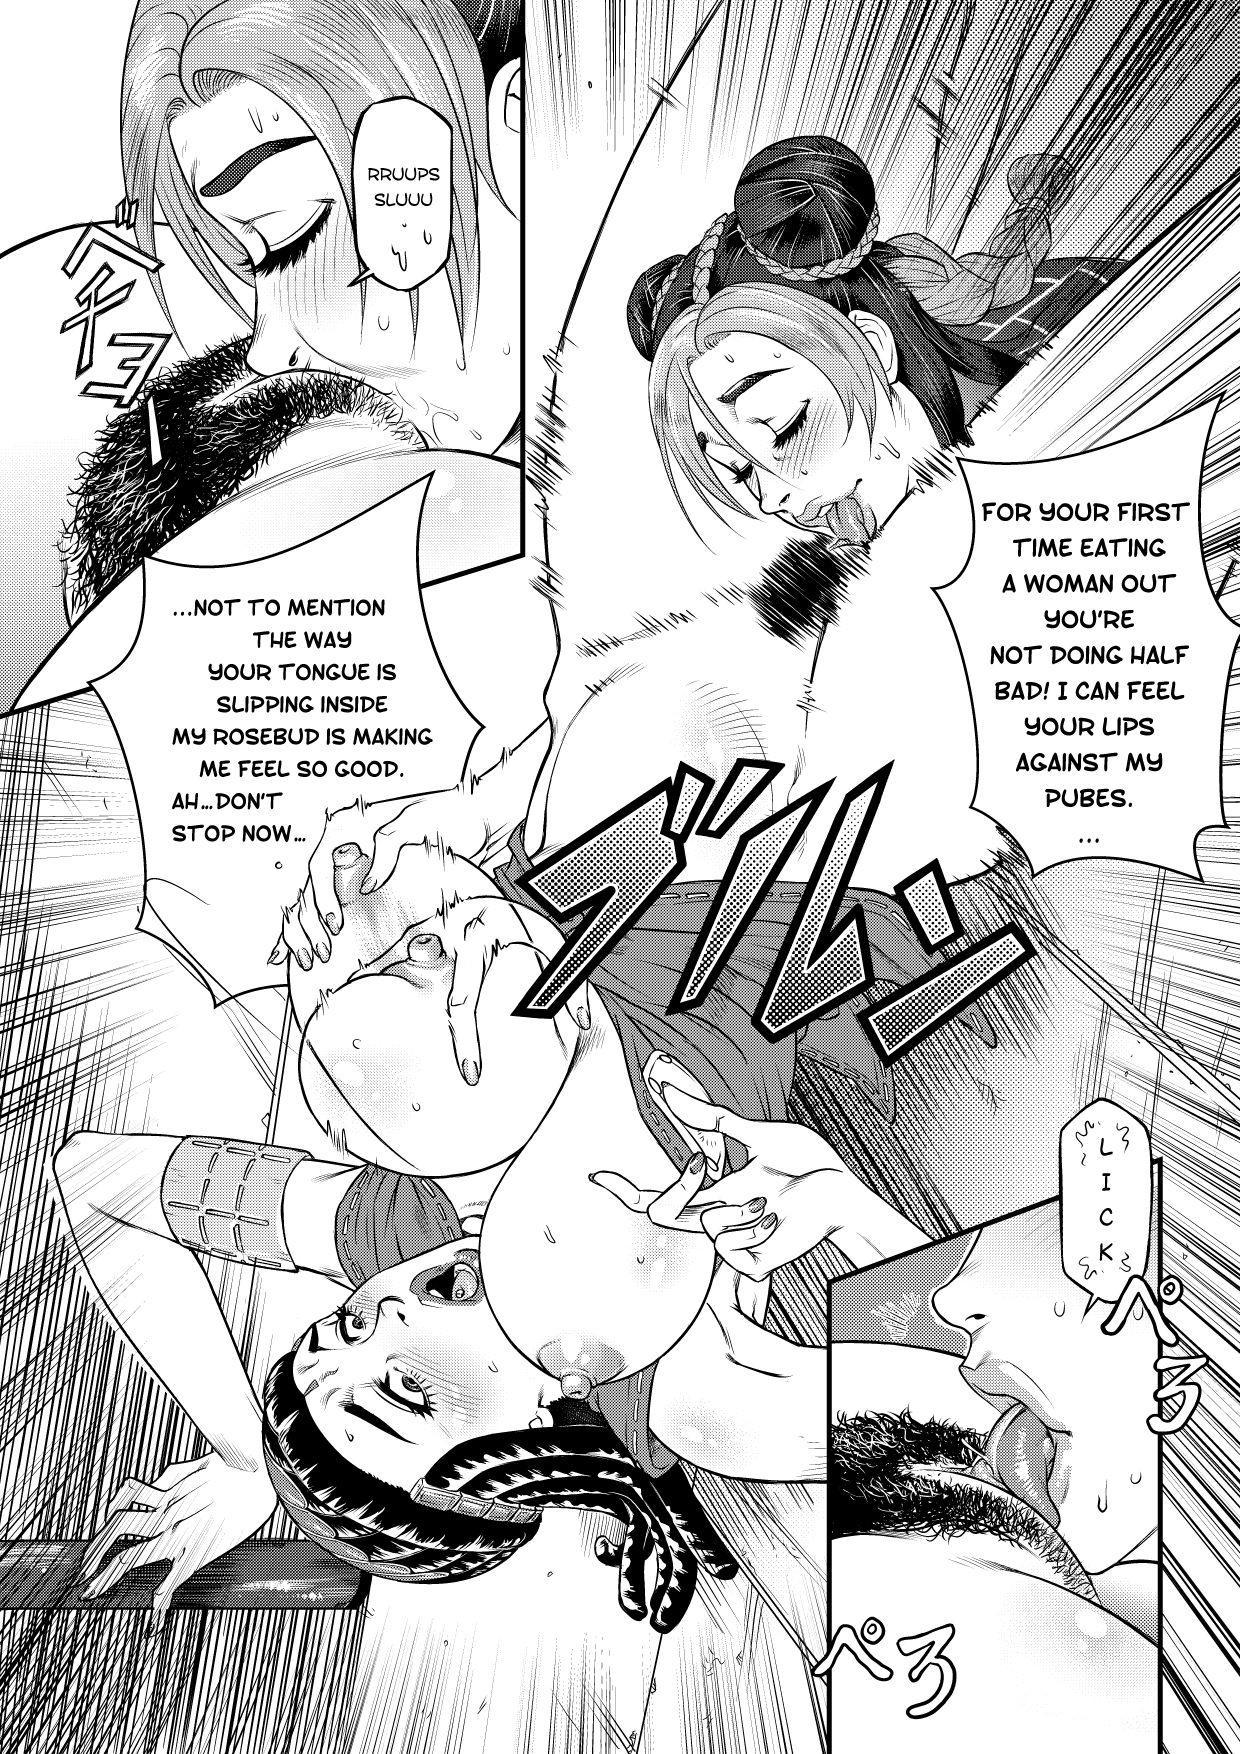 [Karasu] JoJo's Bizarre Adventure - Stone Ocean - Girls by Night + Bonus (english) 11